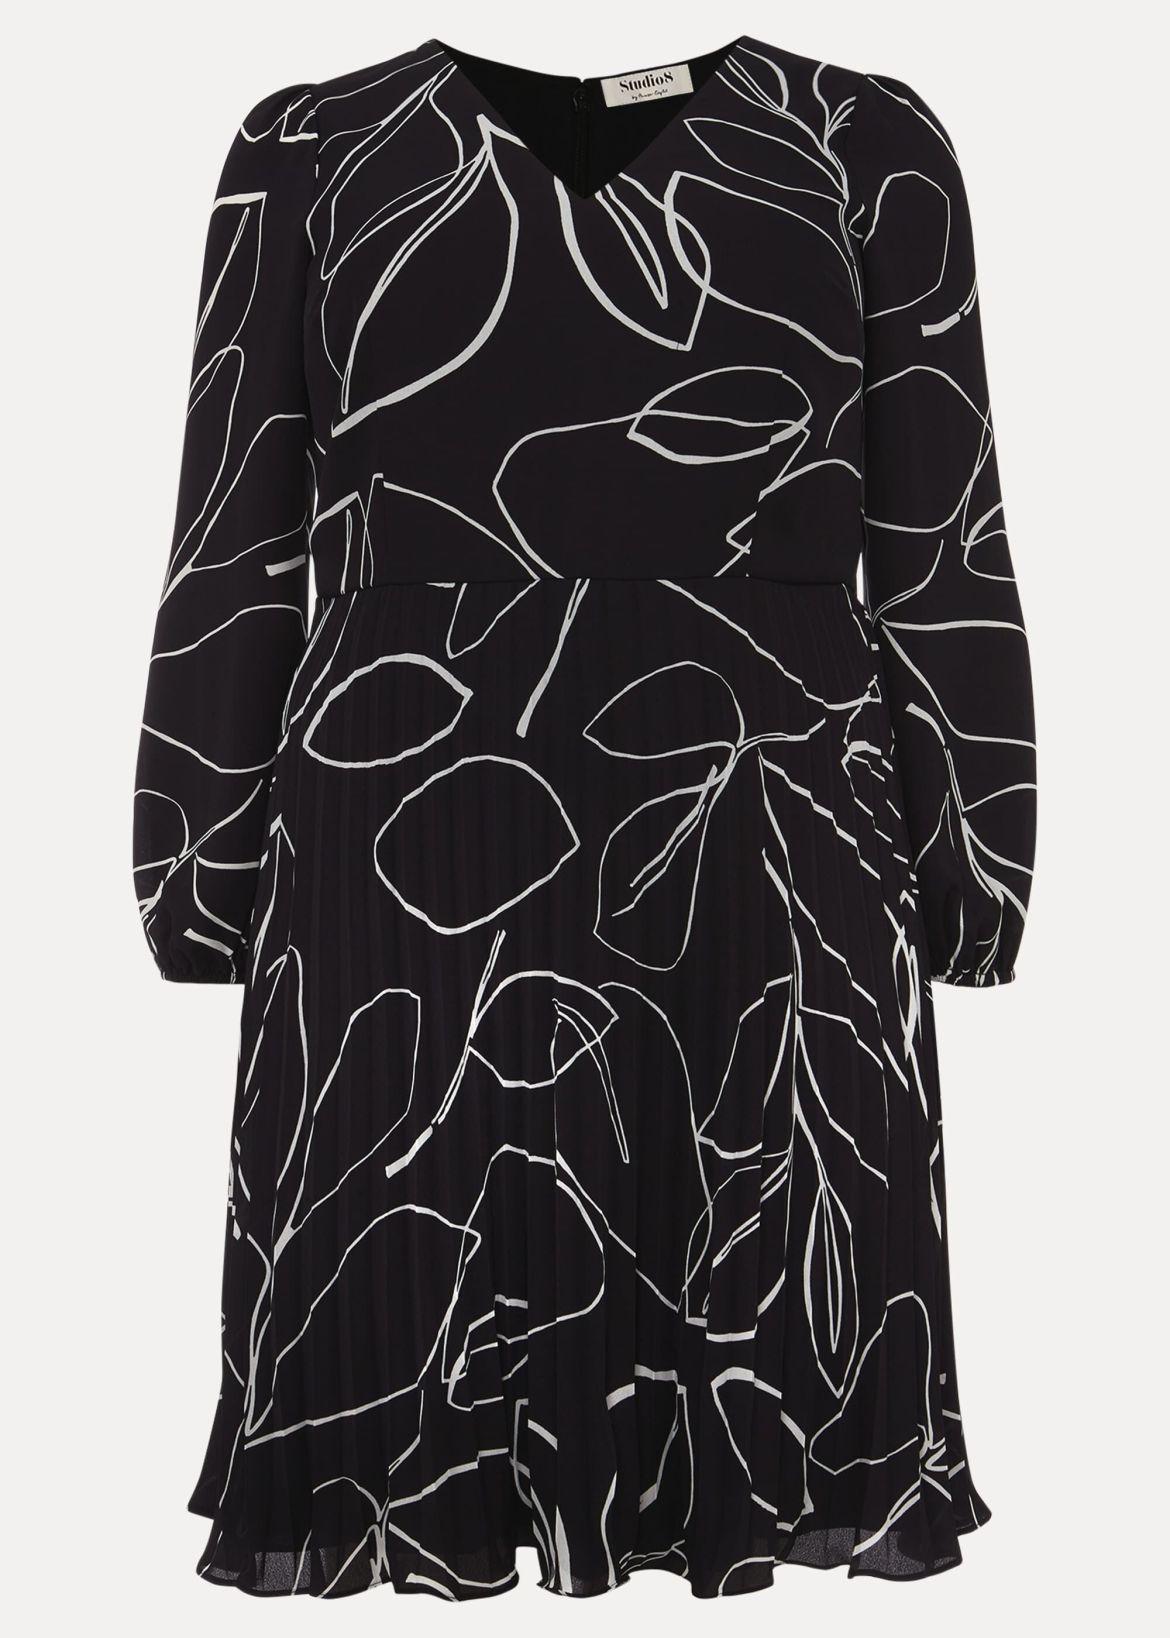 Hetty Pleated Dress